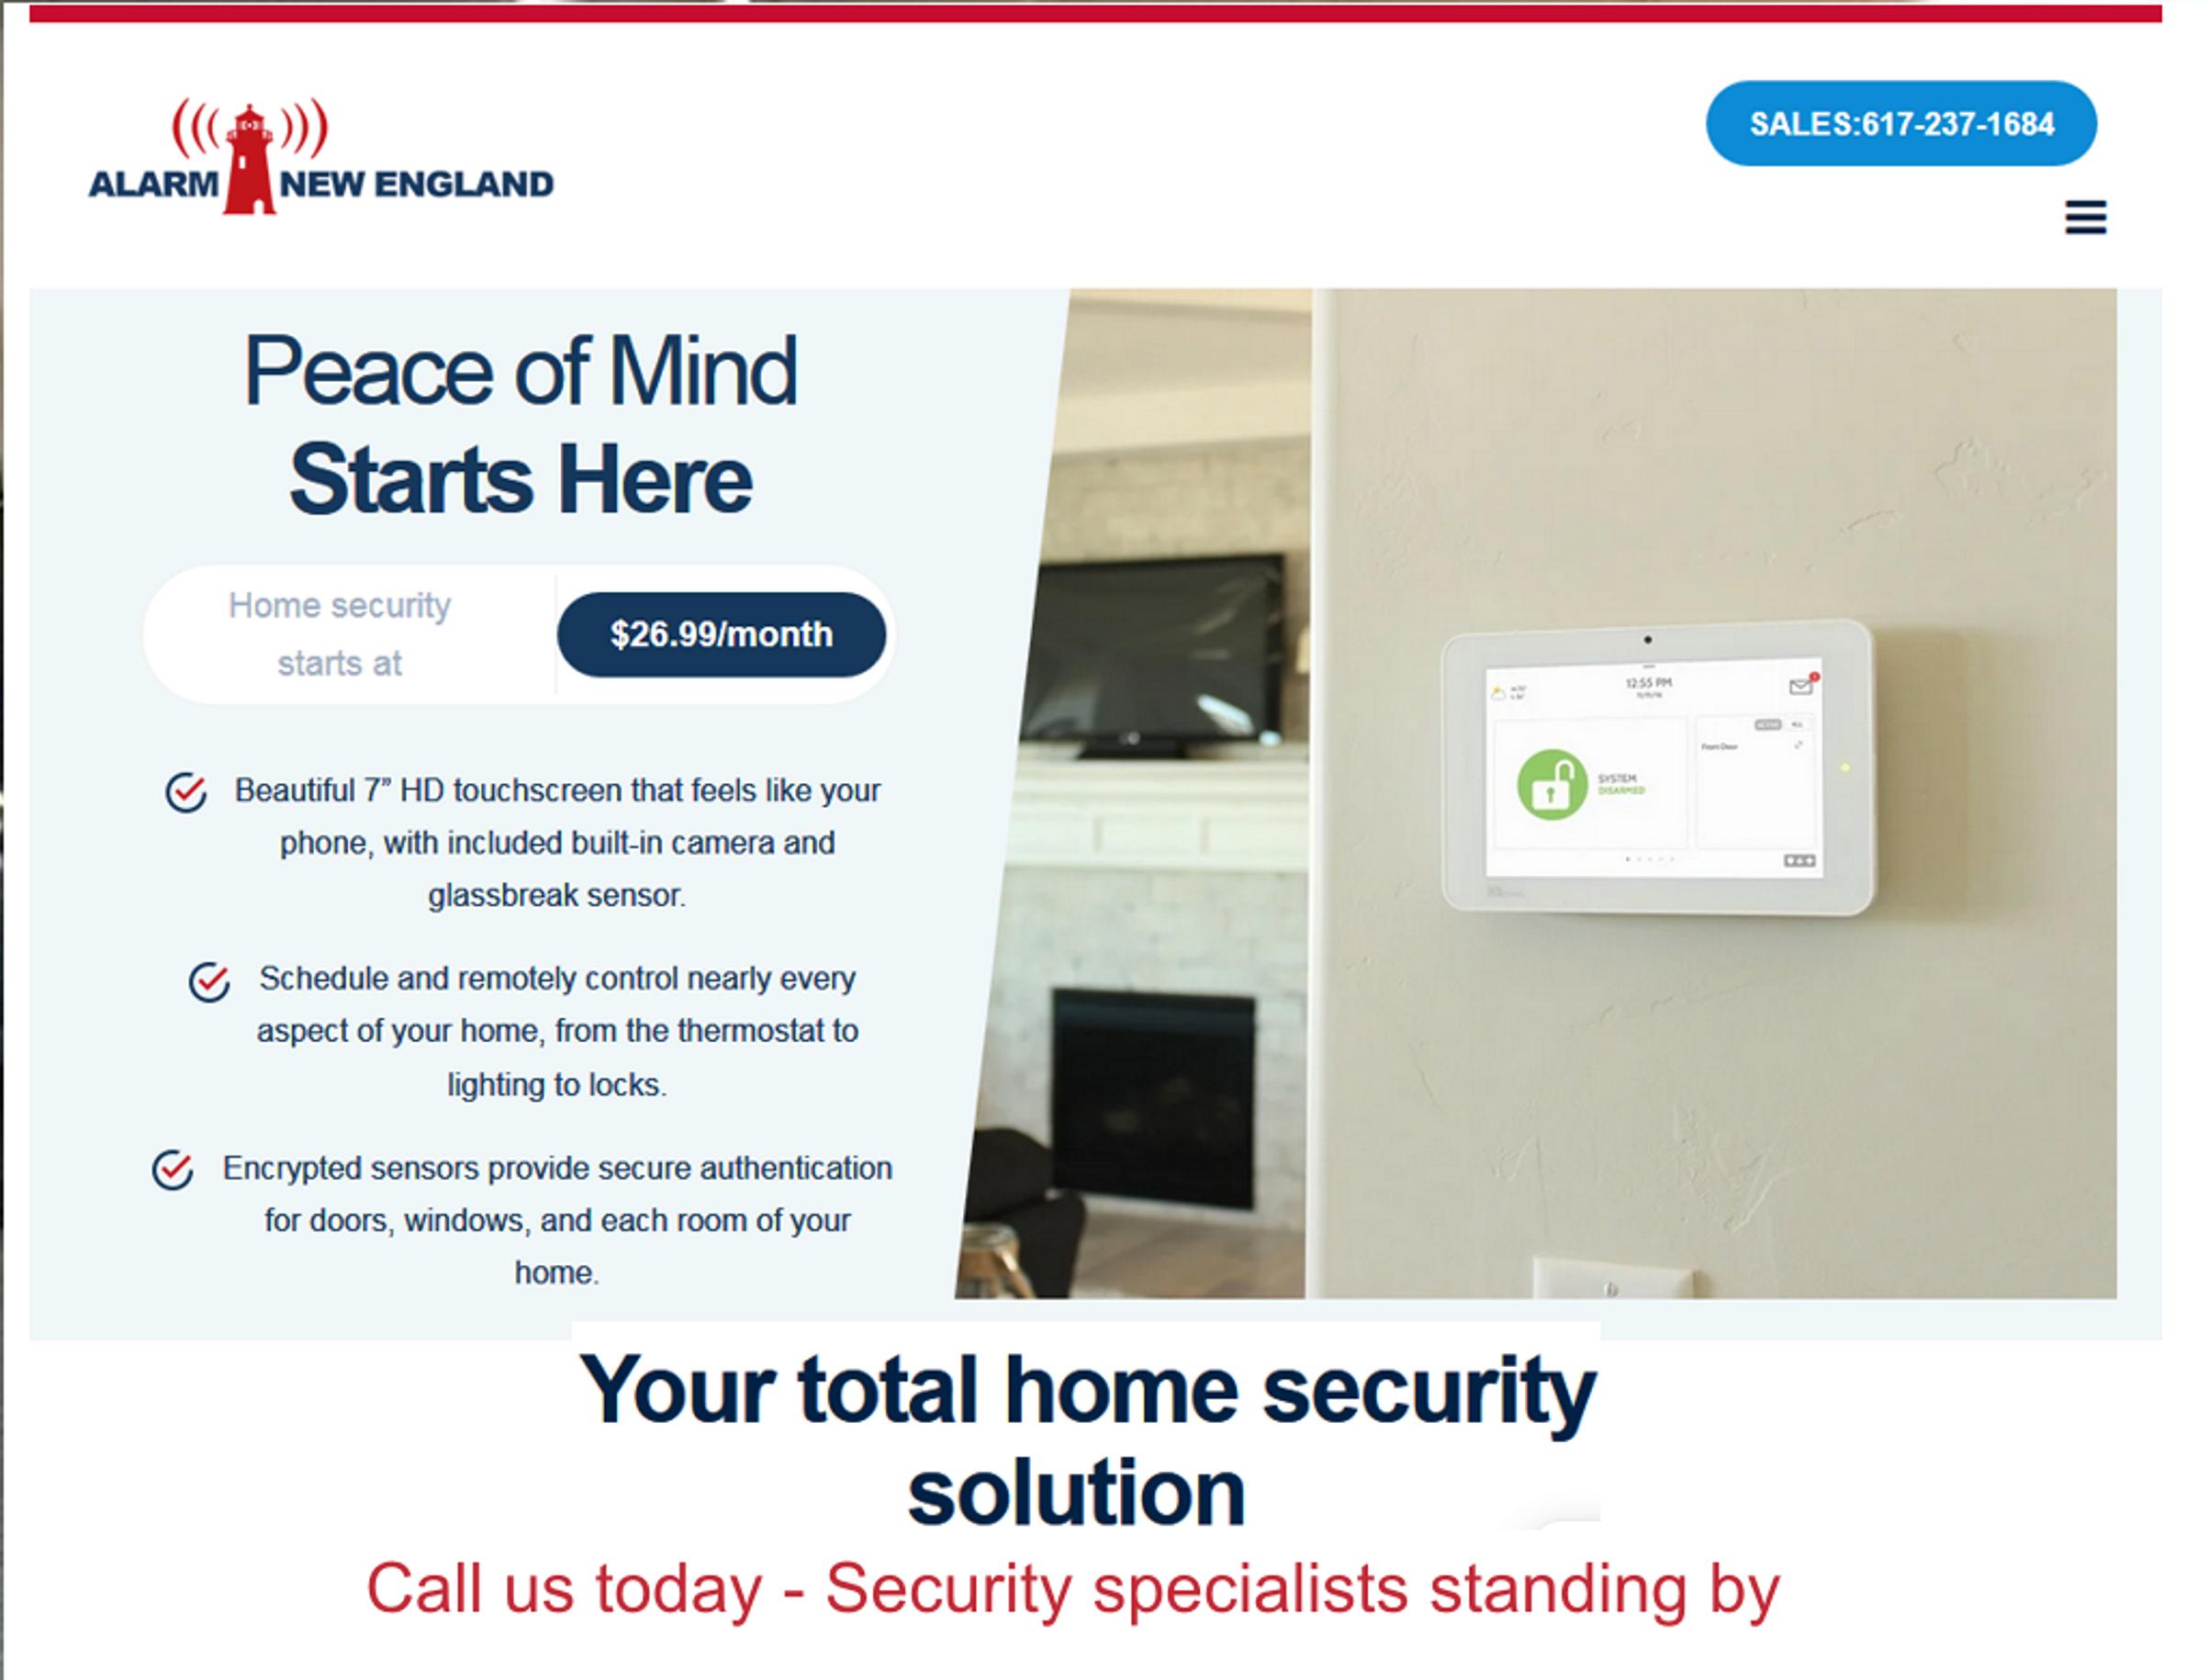 Home security solutions  in North shore / Newburyport ma